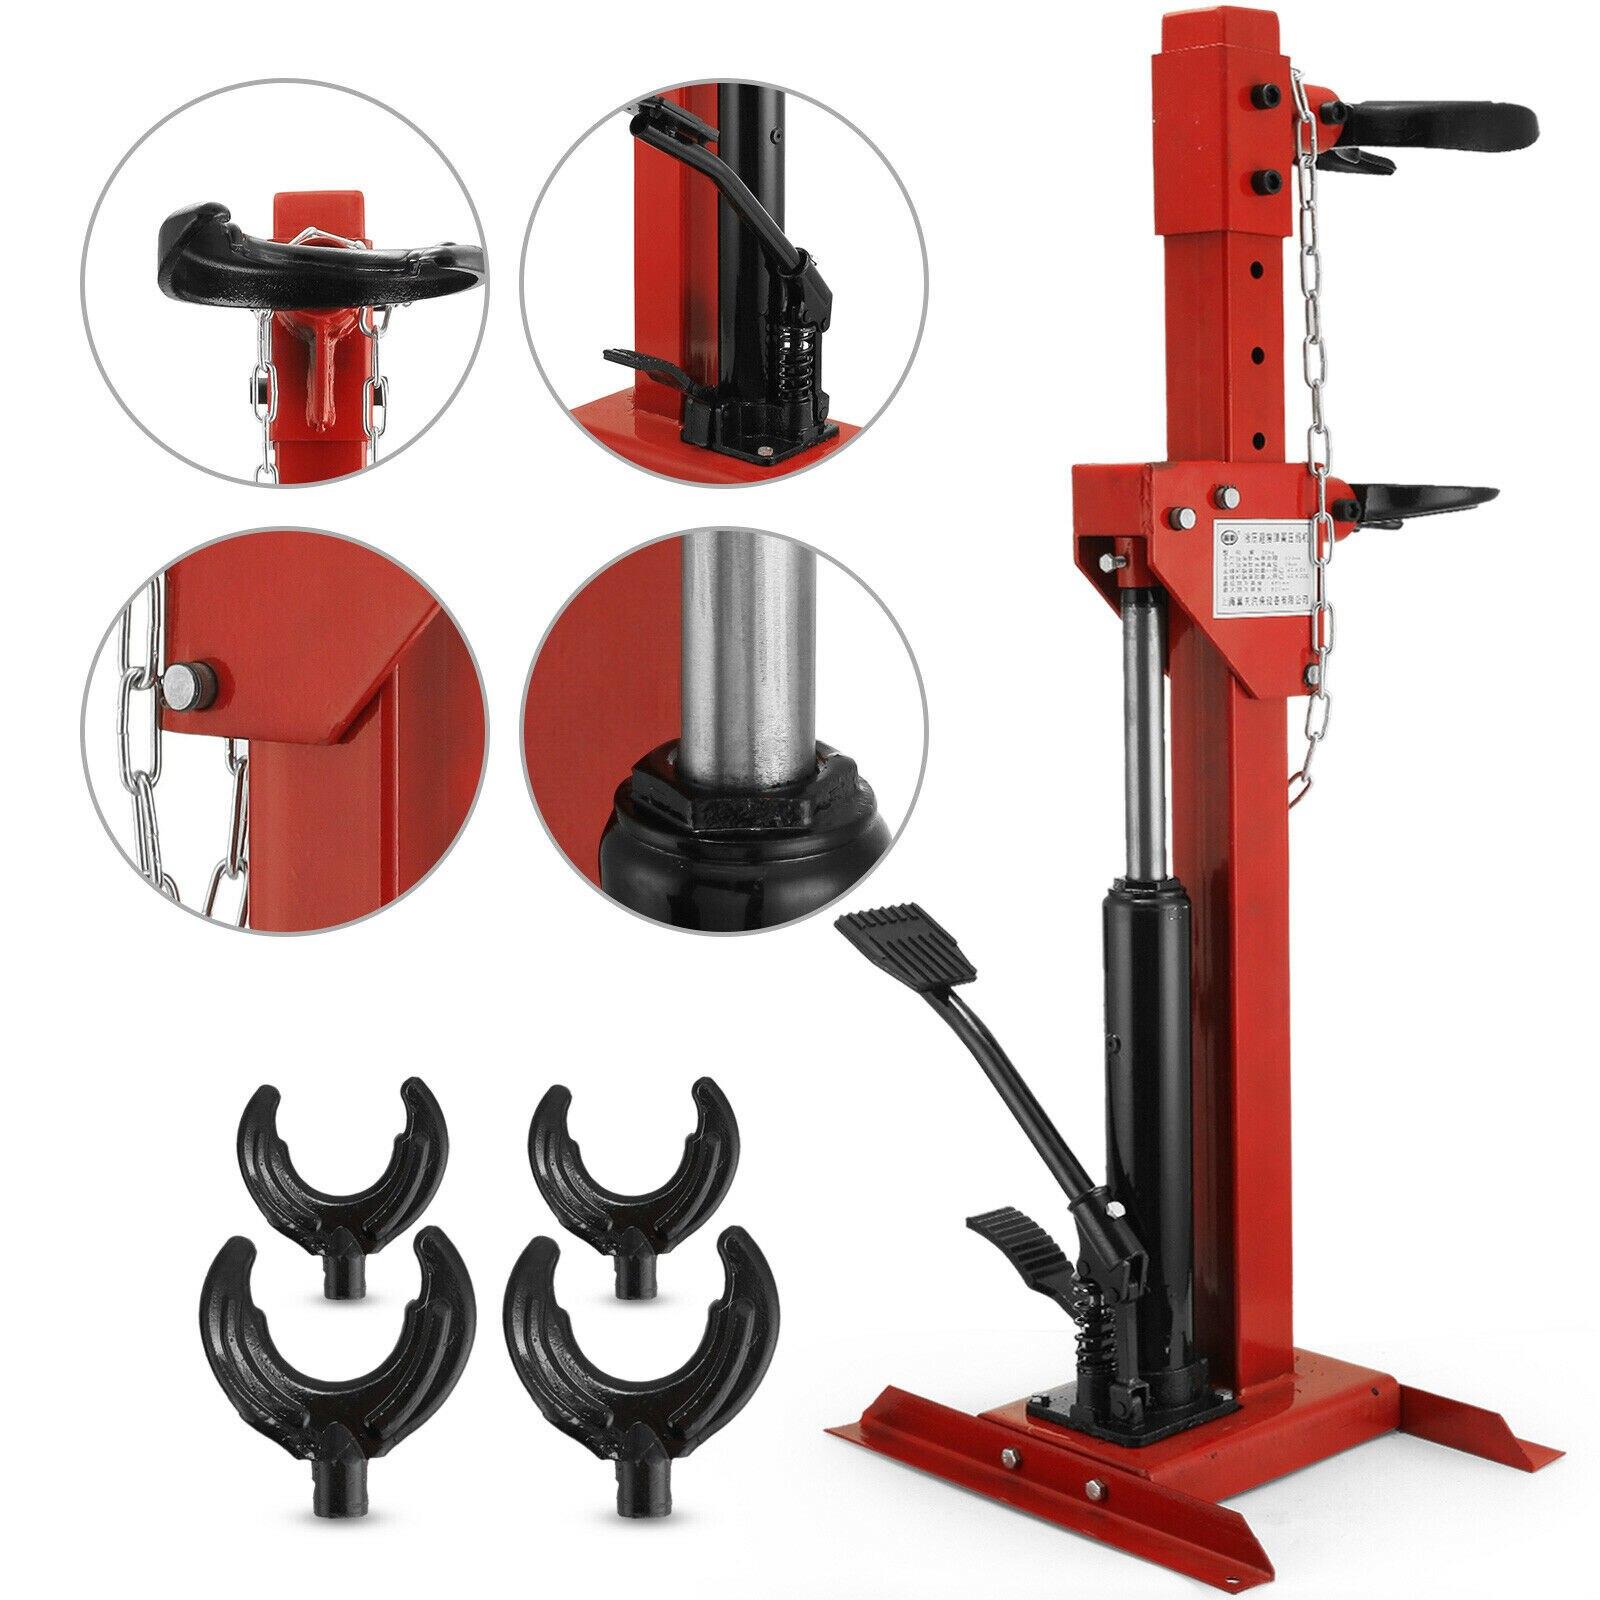 BestEquip 2.5 Ton Strut Spring Compressor Hydraulic Tool Auto Valve Spring Compressor 14Inch Coil Spring Compressor Set